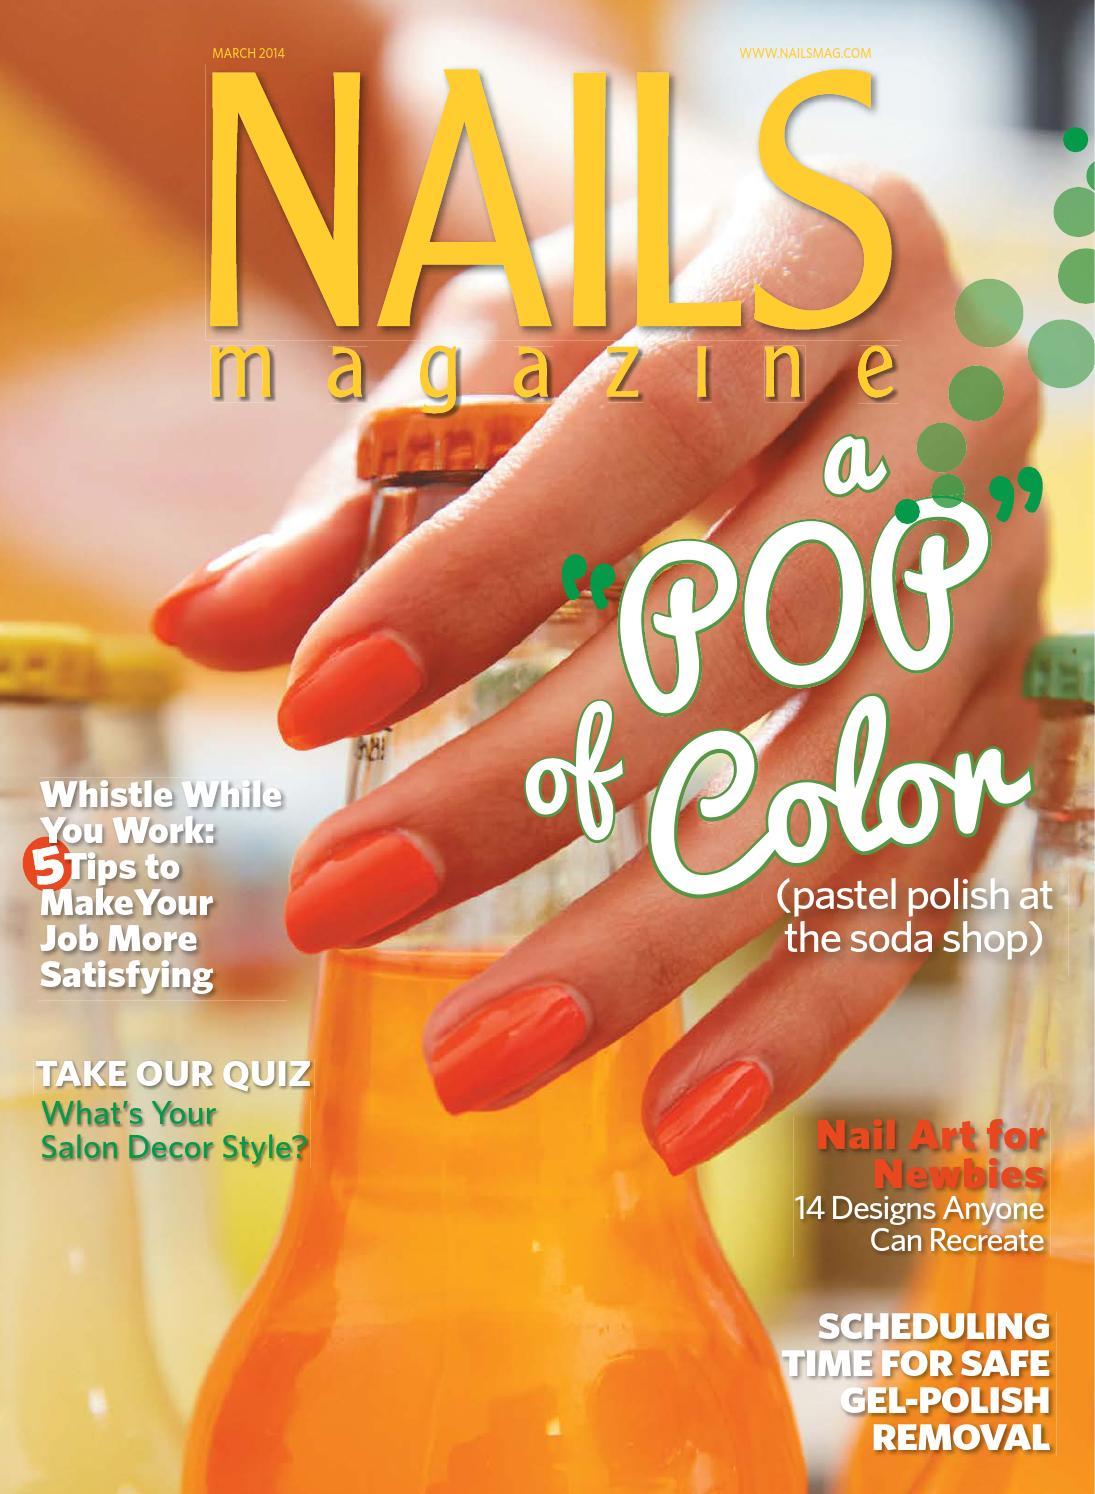 Nails Magazine 2014 03 By Reforma Nails Cz Issuu